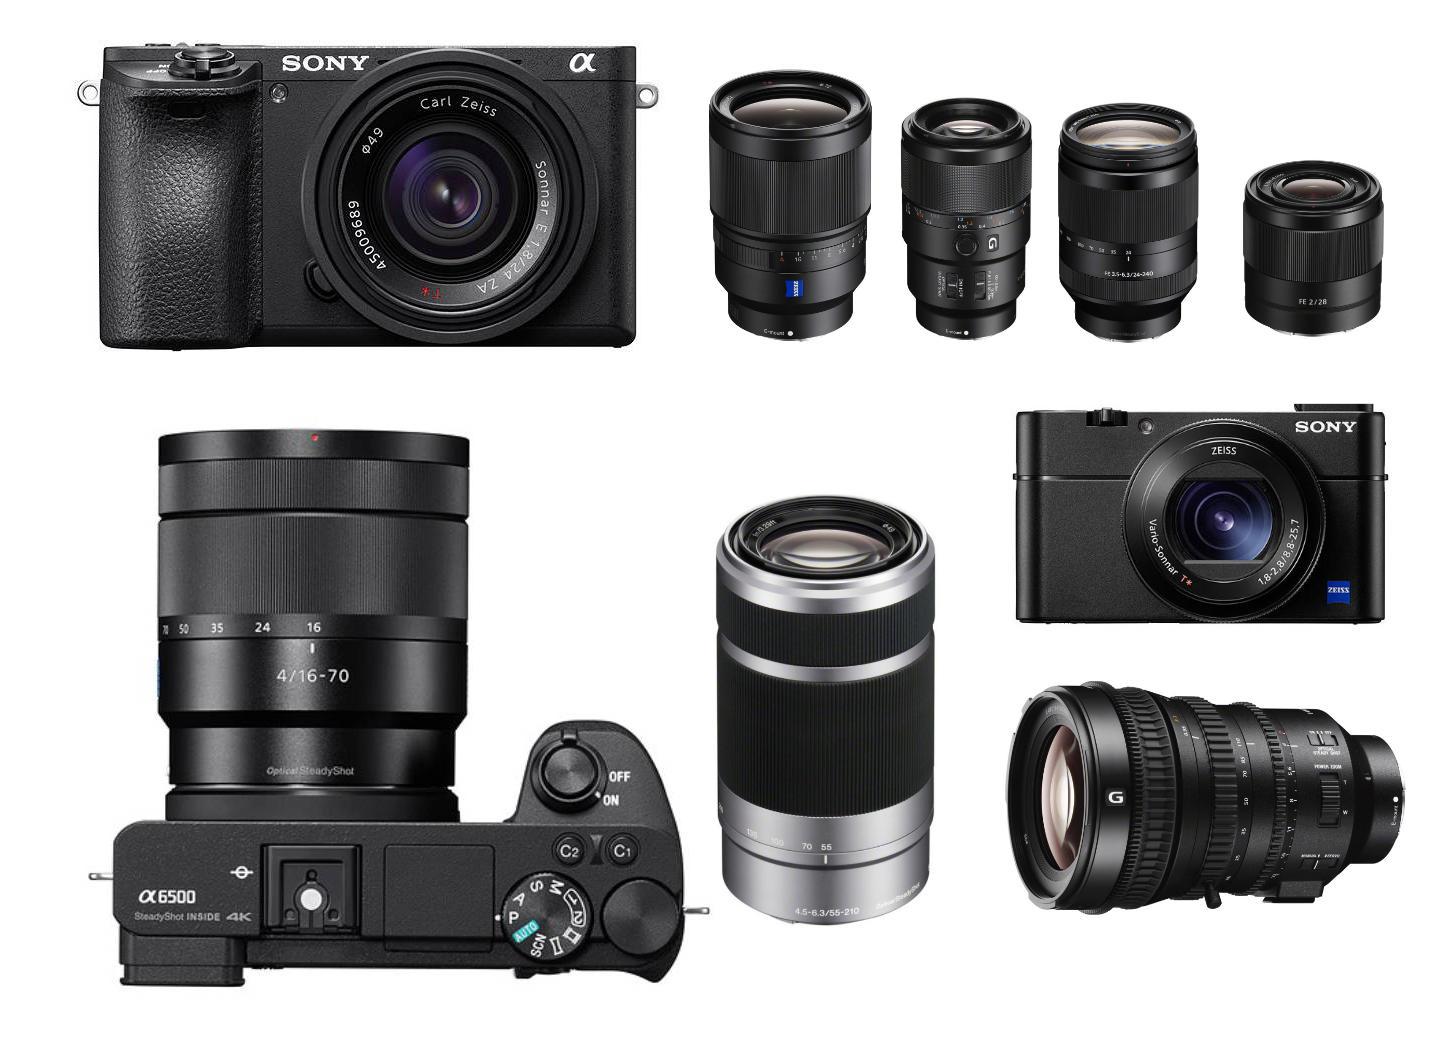 My Sony Camera Wish List